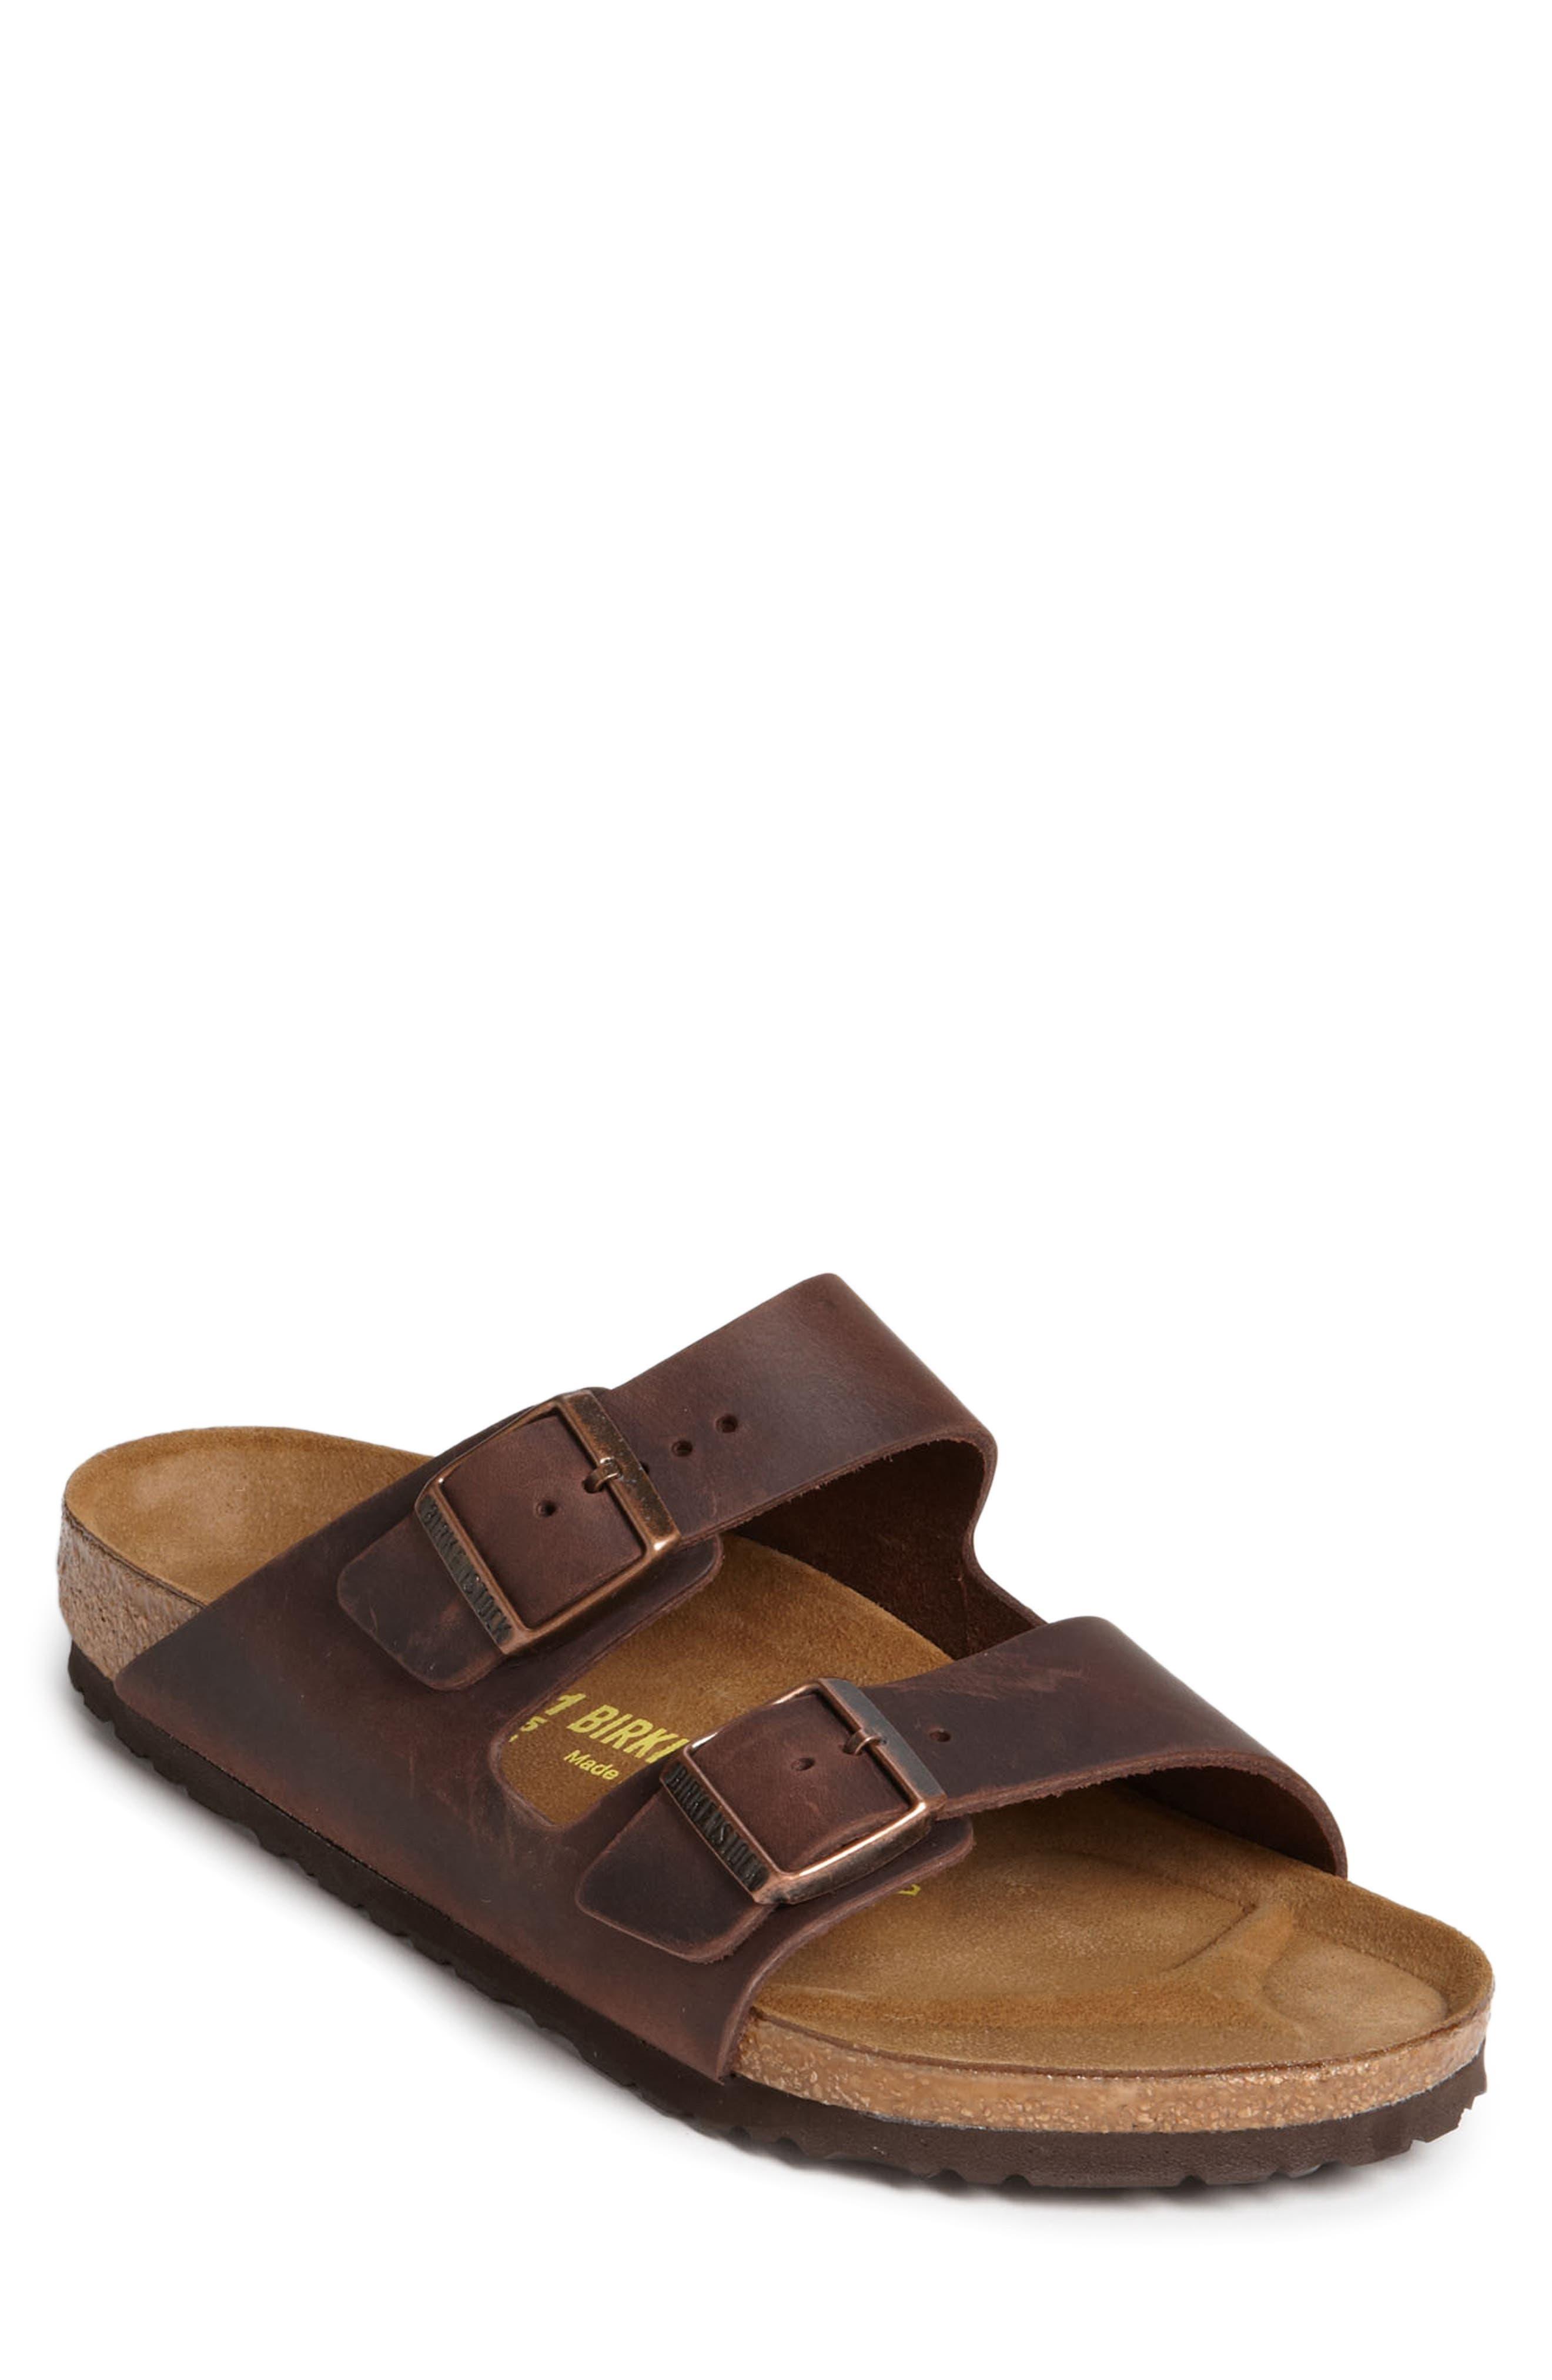 Arizona Slide Sandal,                         Main,                         color, HABANA OILED BROWN